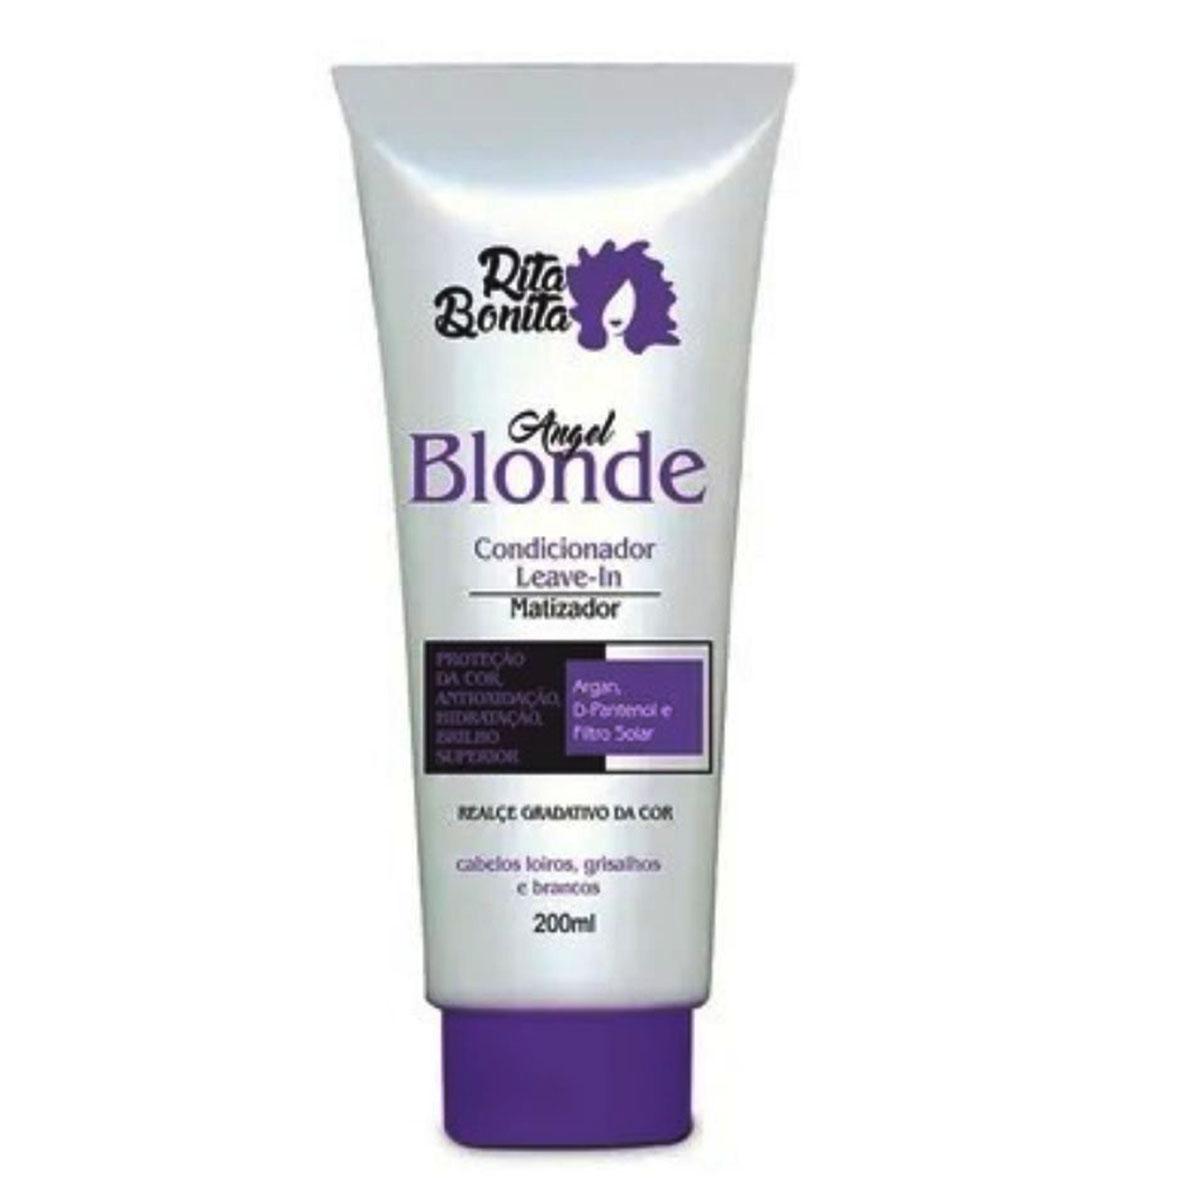 Angel Blonde - Condicionardor/Leave-in Rita Bonita 200ml - Com Proteção Termica e Filtro Solar